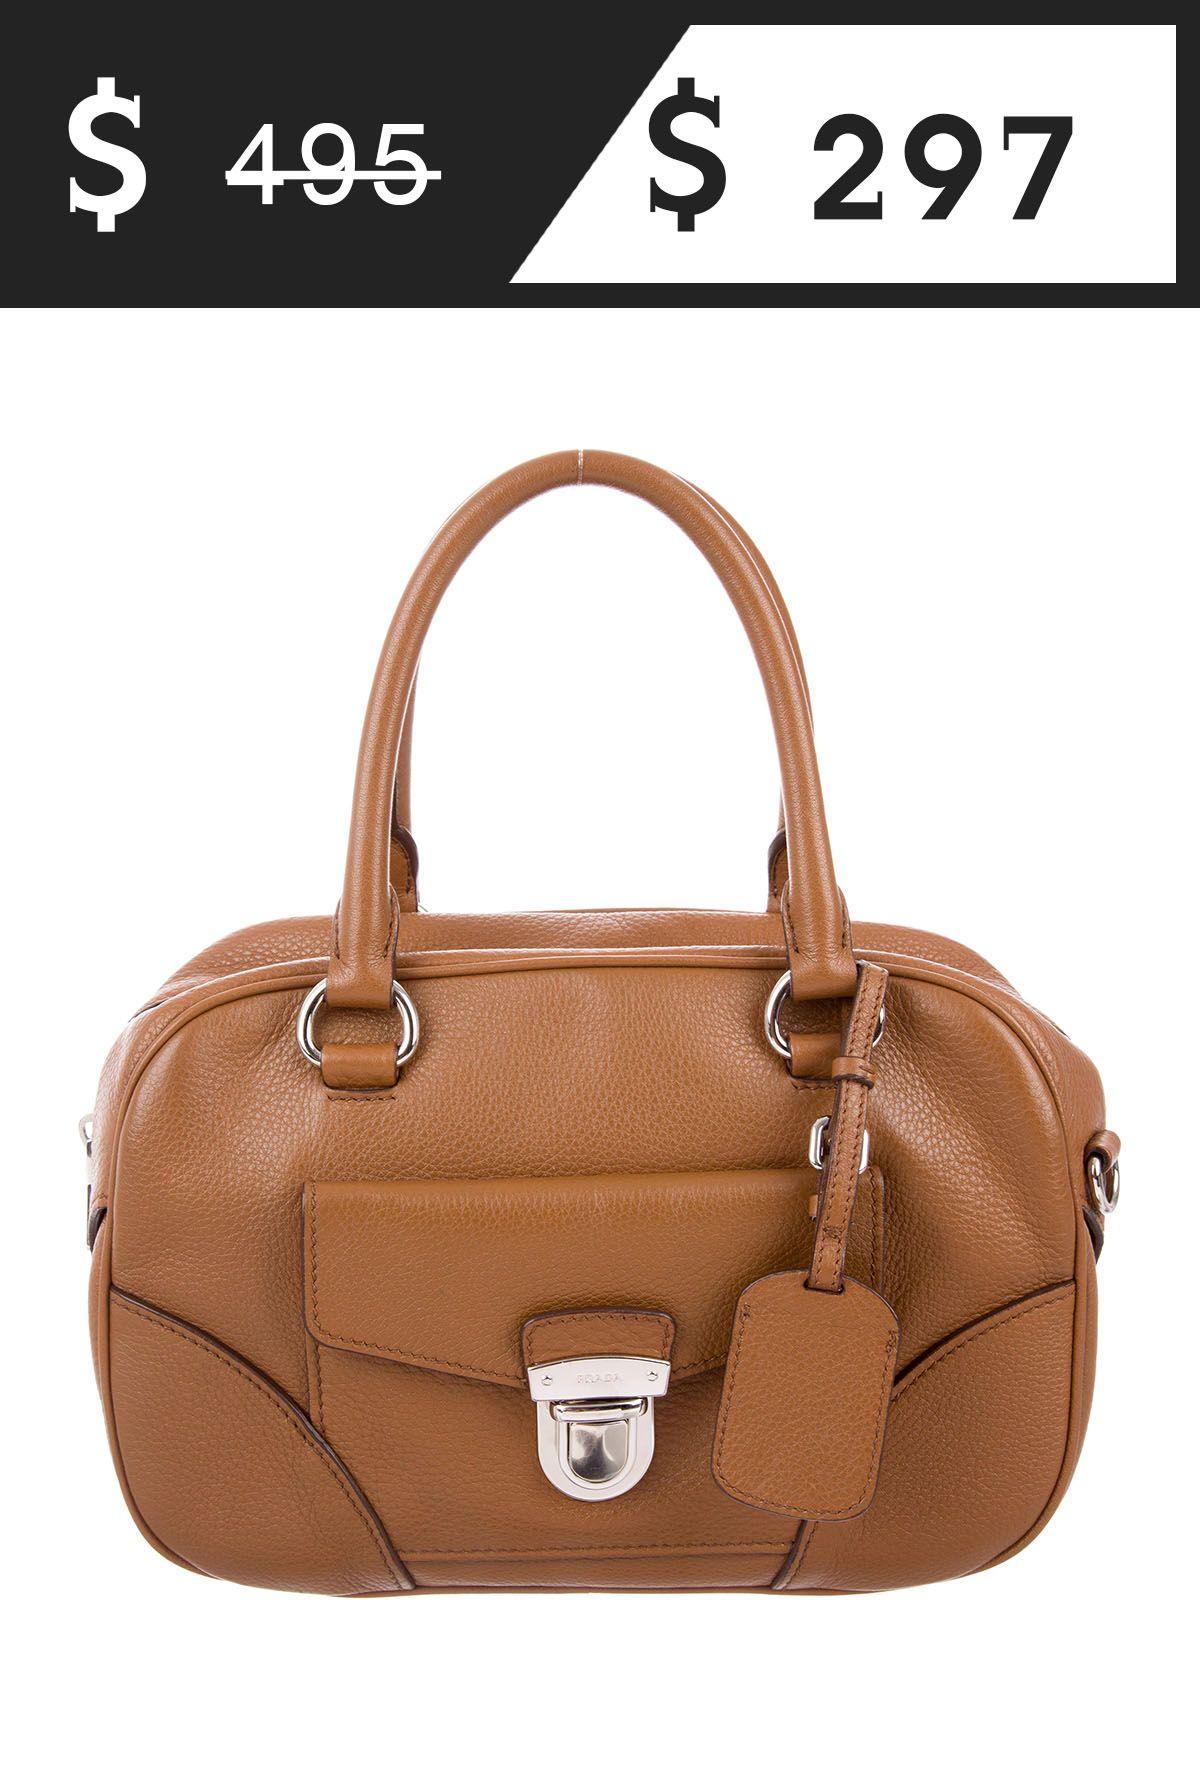 Prada Prada Vitello Daino Bauletto Bag  297  495 at TheRealReal Update  5 5 2018 854747db59e77